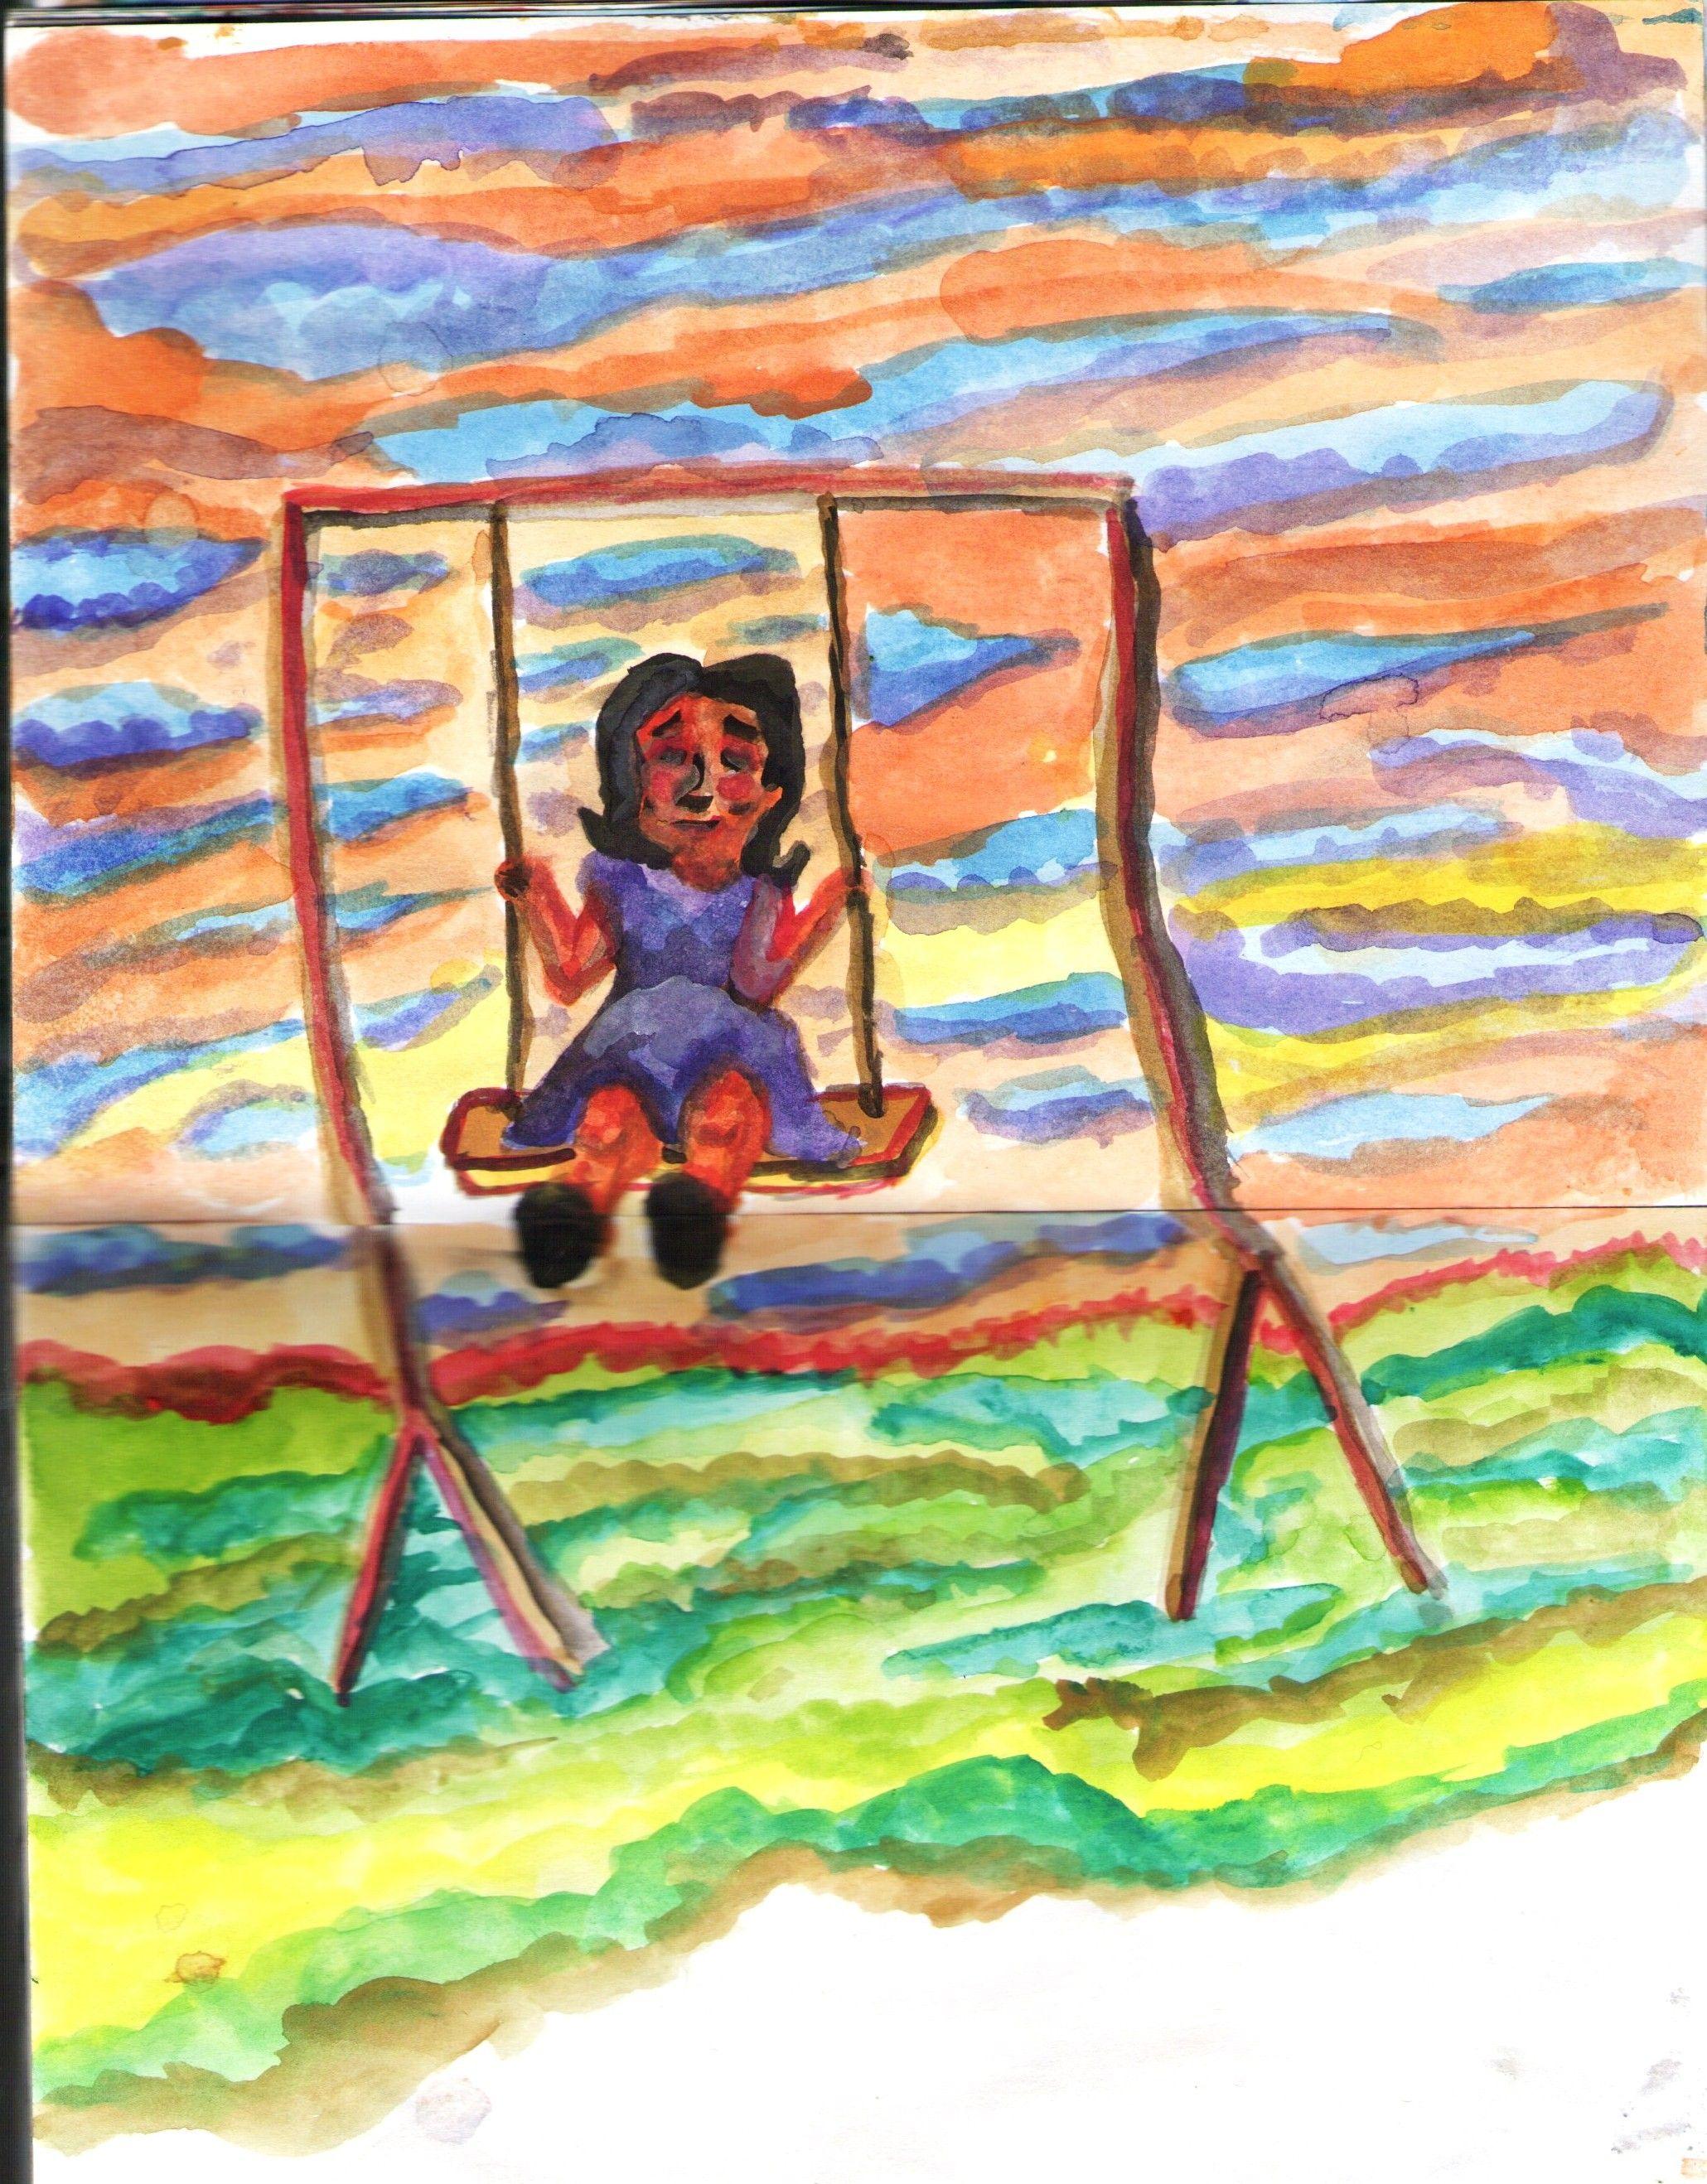 """Swing Girl"" by Rony."